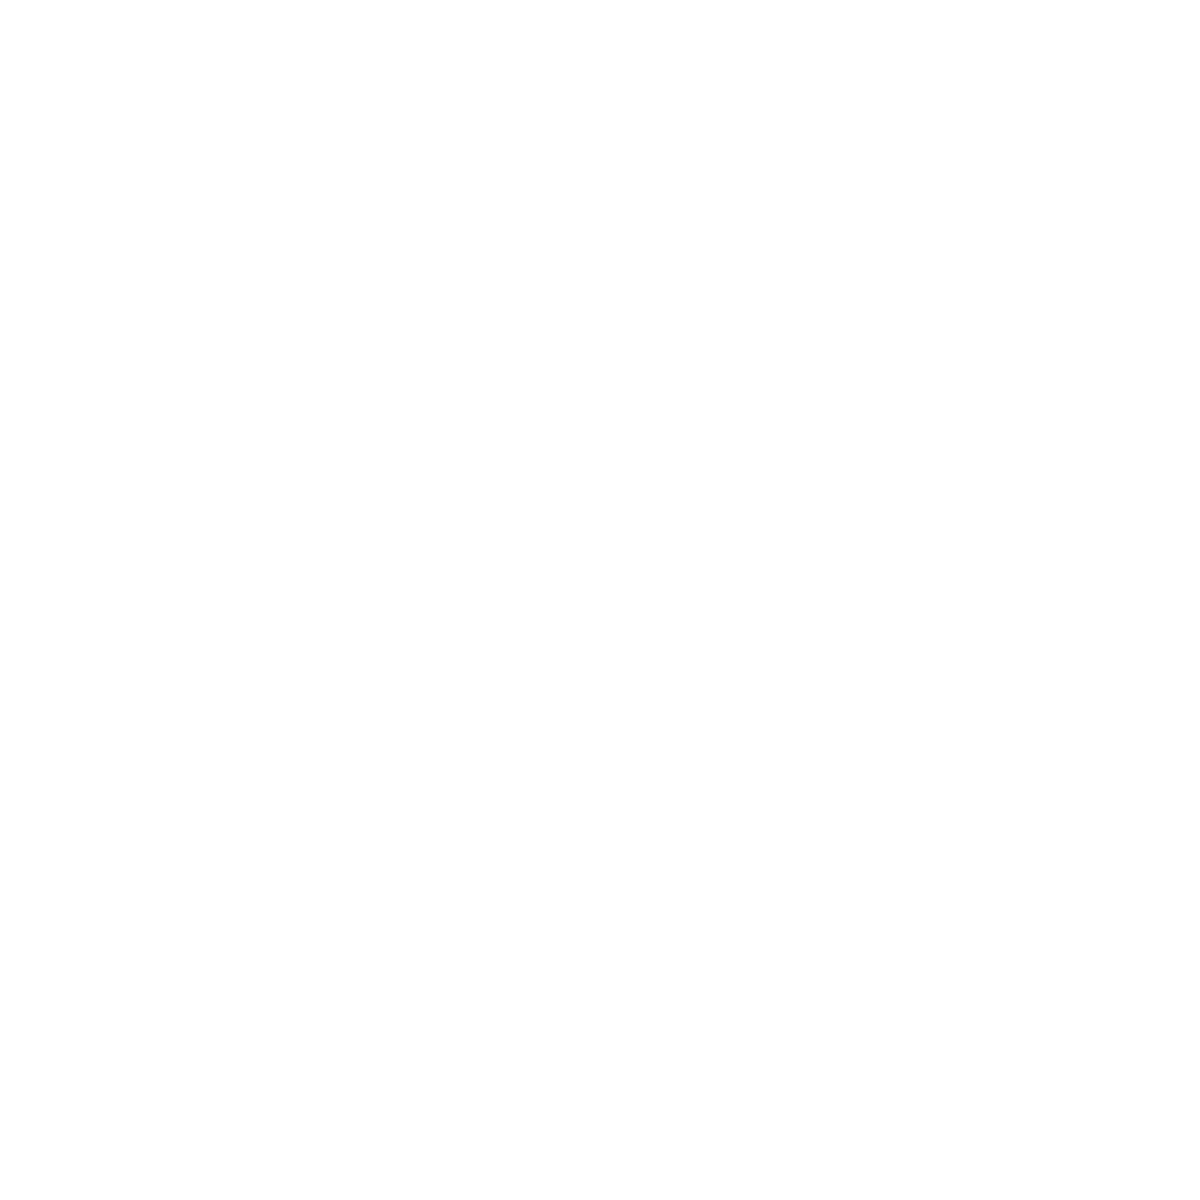 Tlauncher бонусный коды Бонусные коды